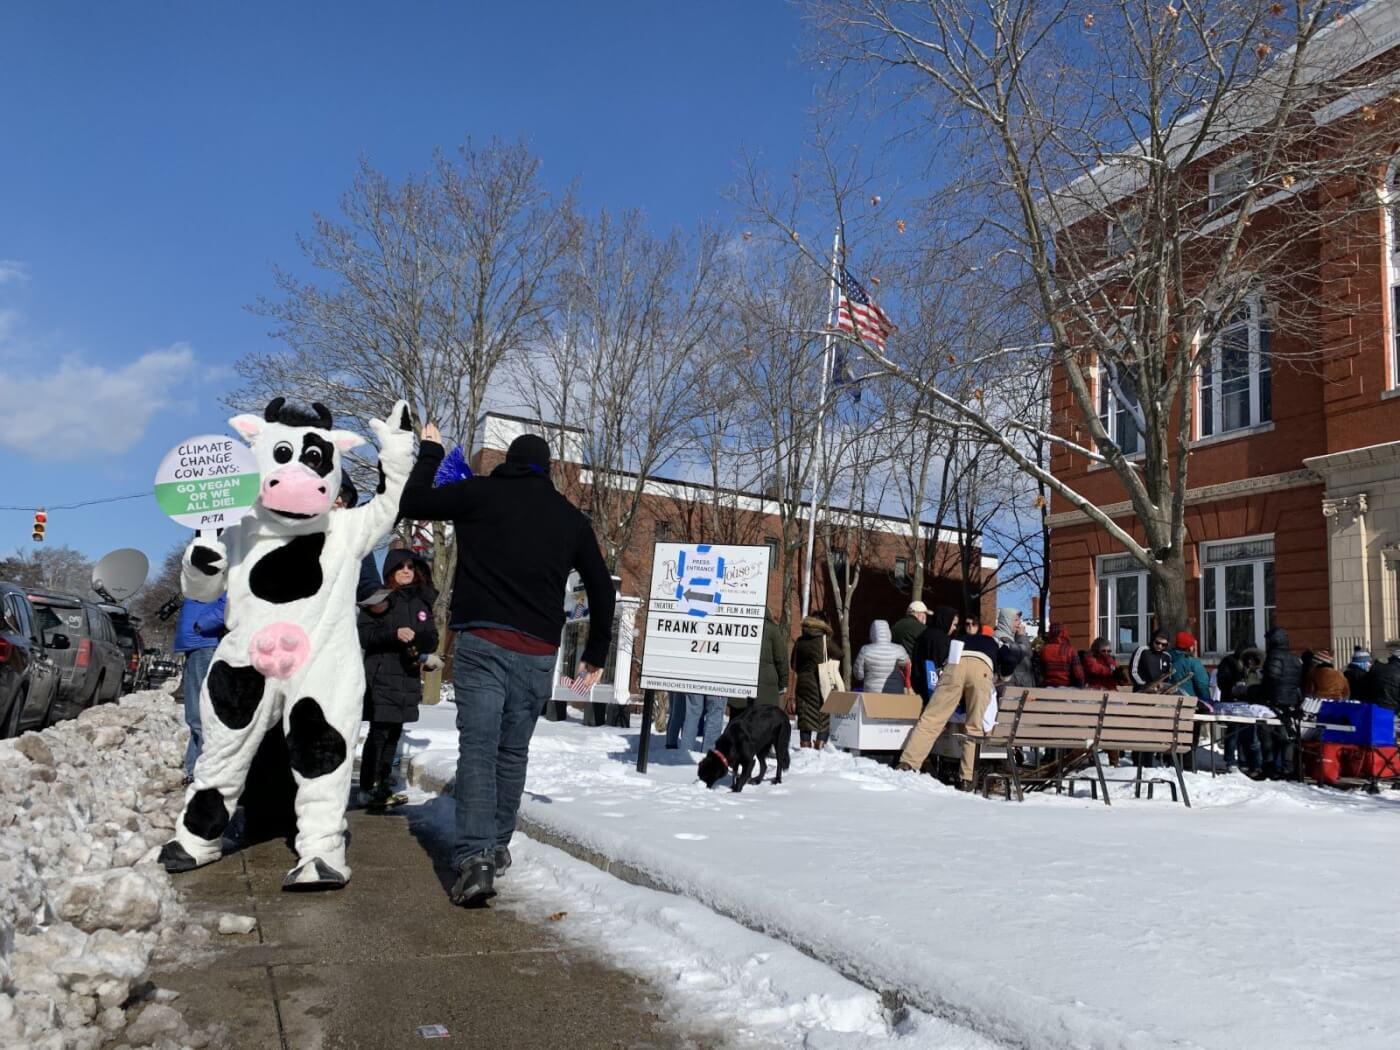 peta climate change cow new hampshire primary